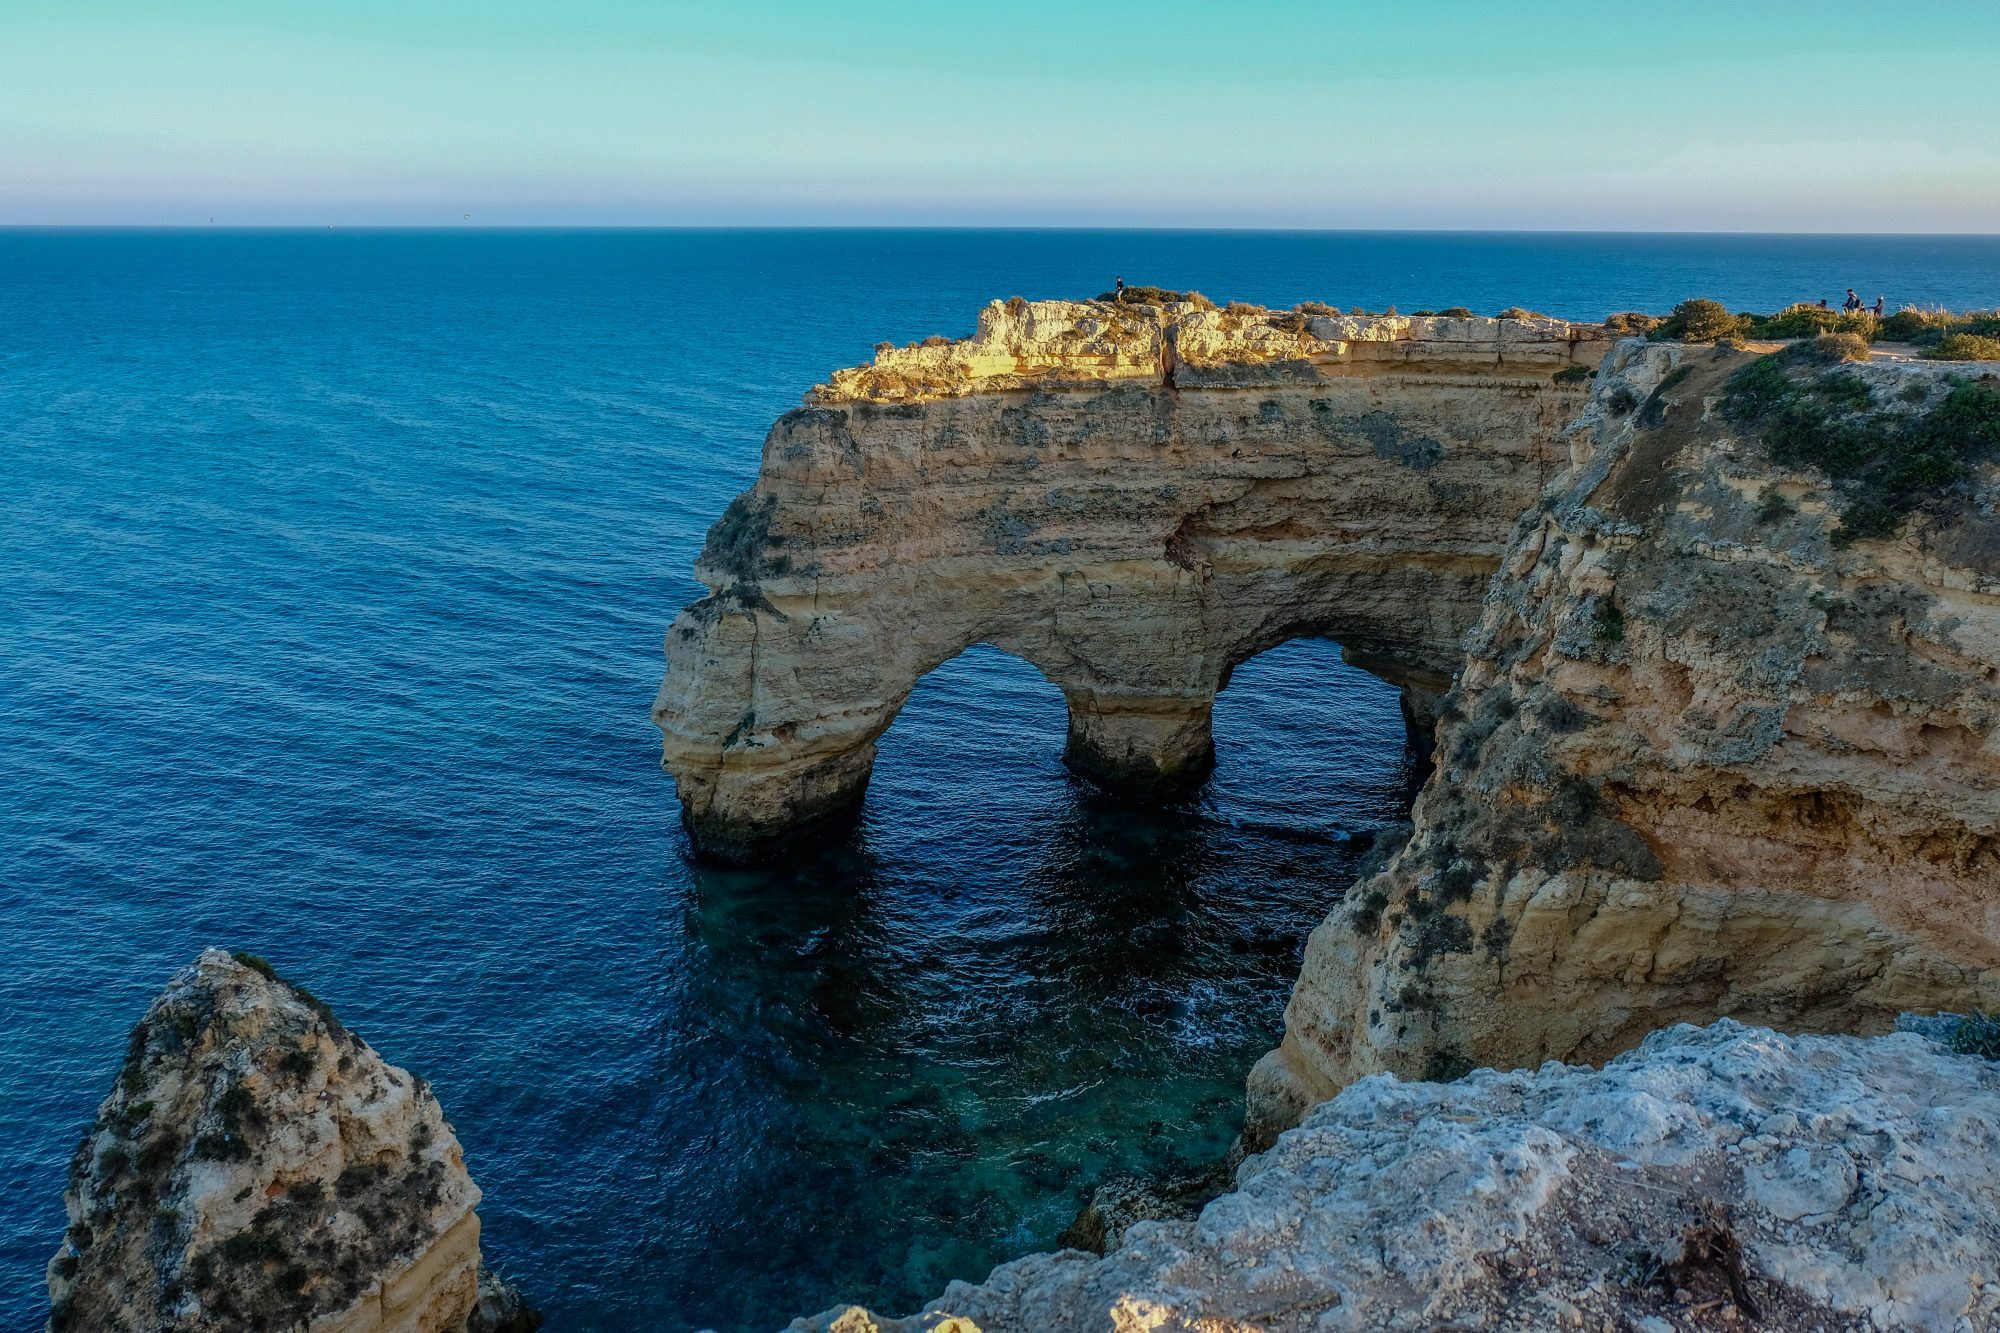 Heart Rocks - Lagoa, Portugal